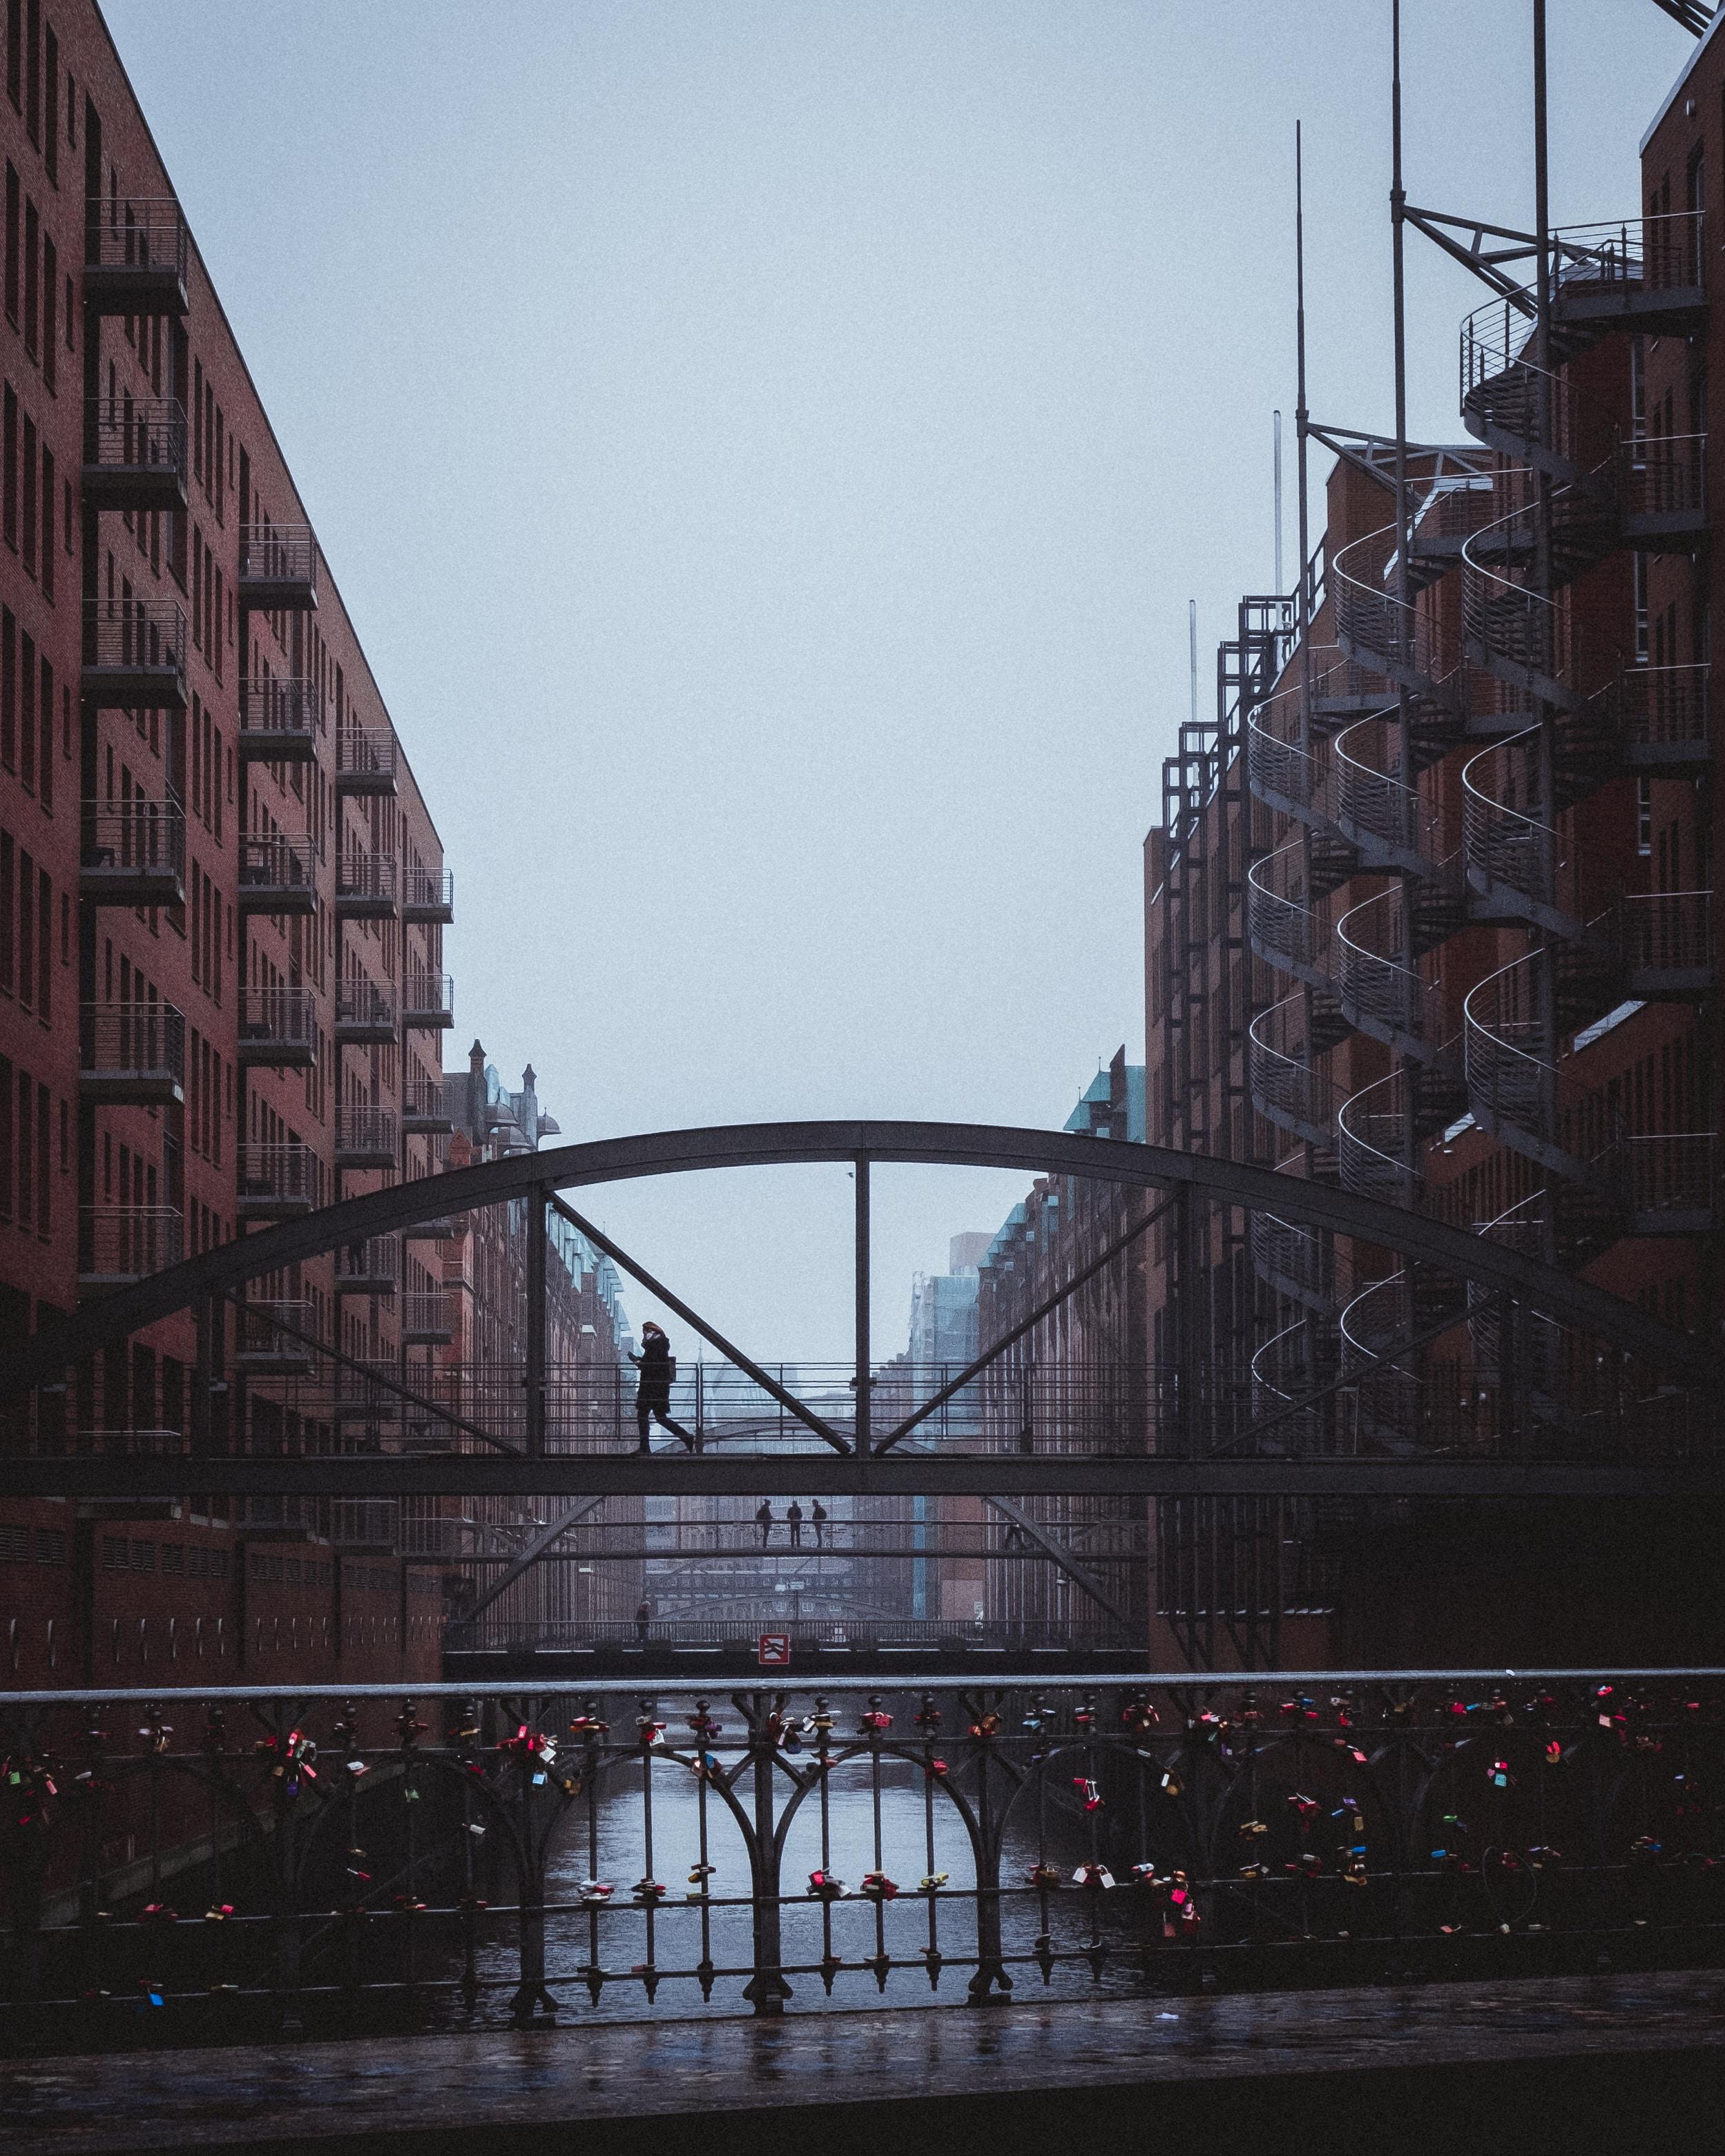 person walking on bridge